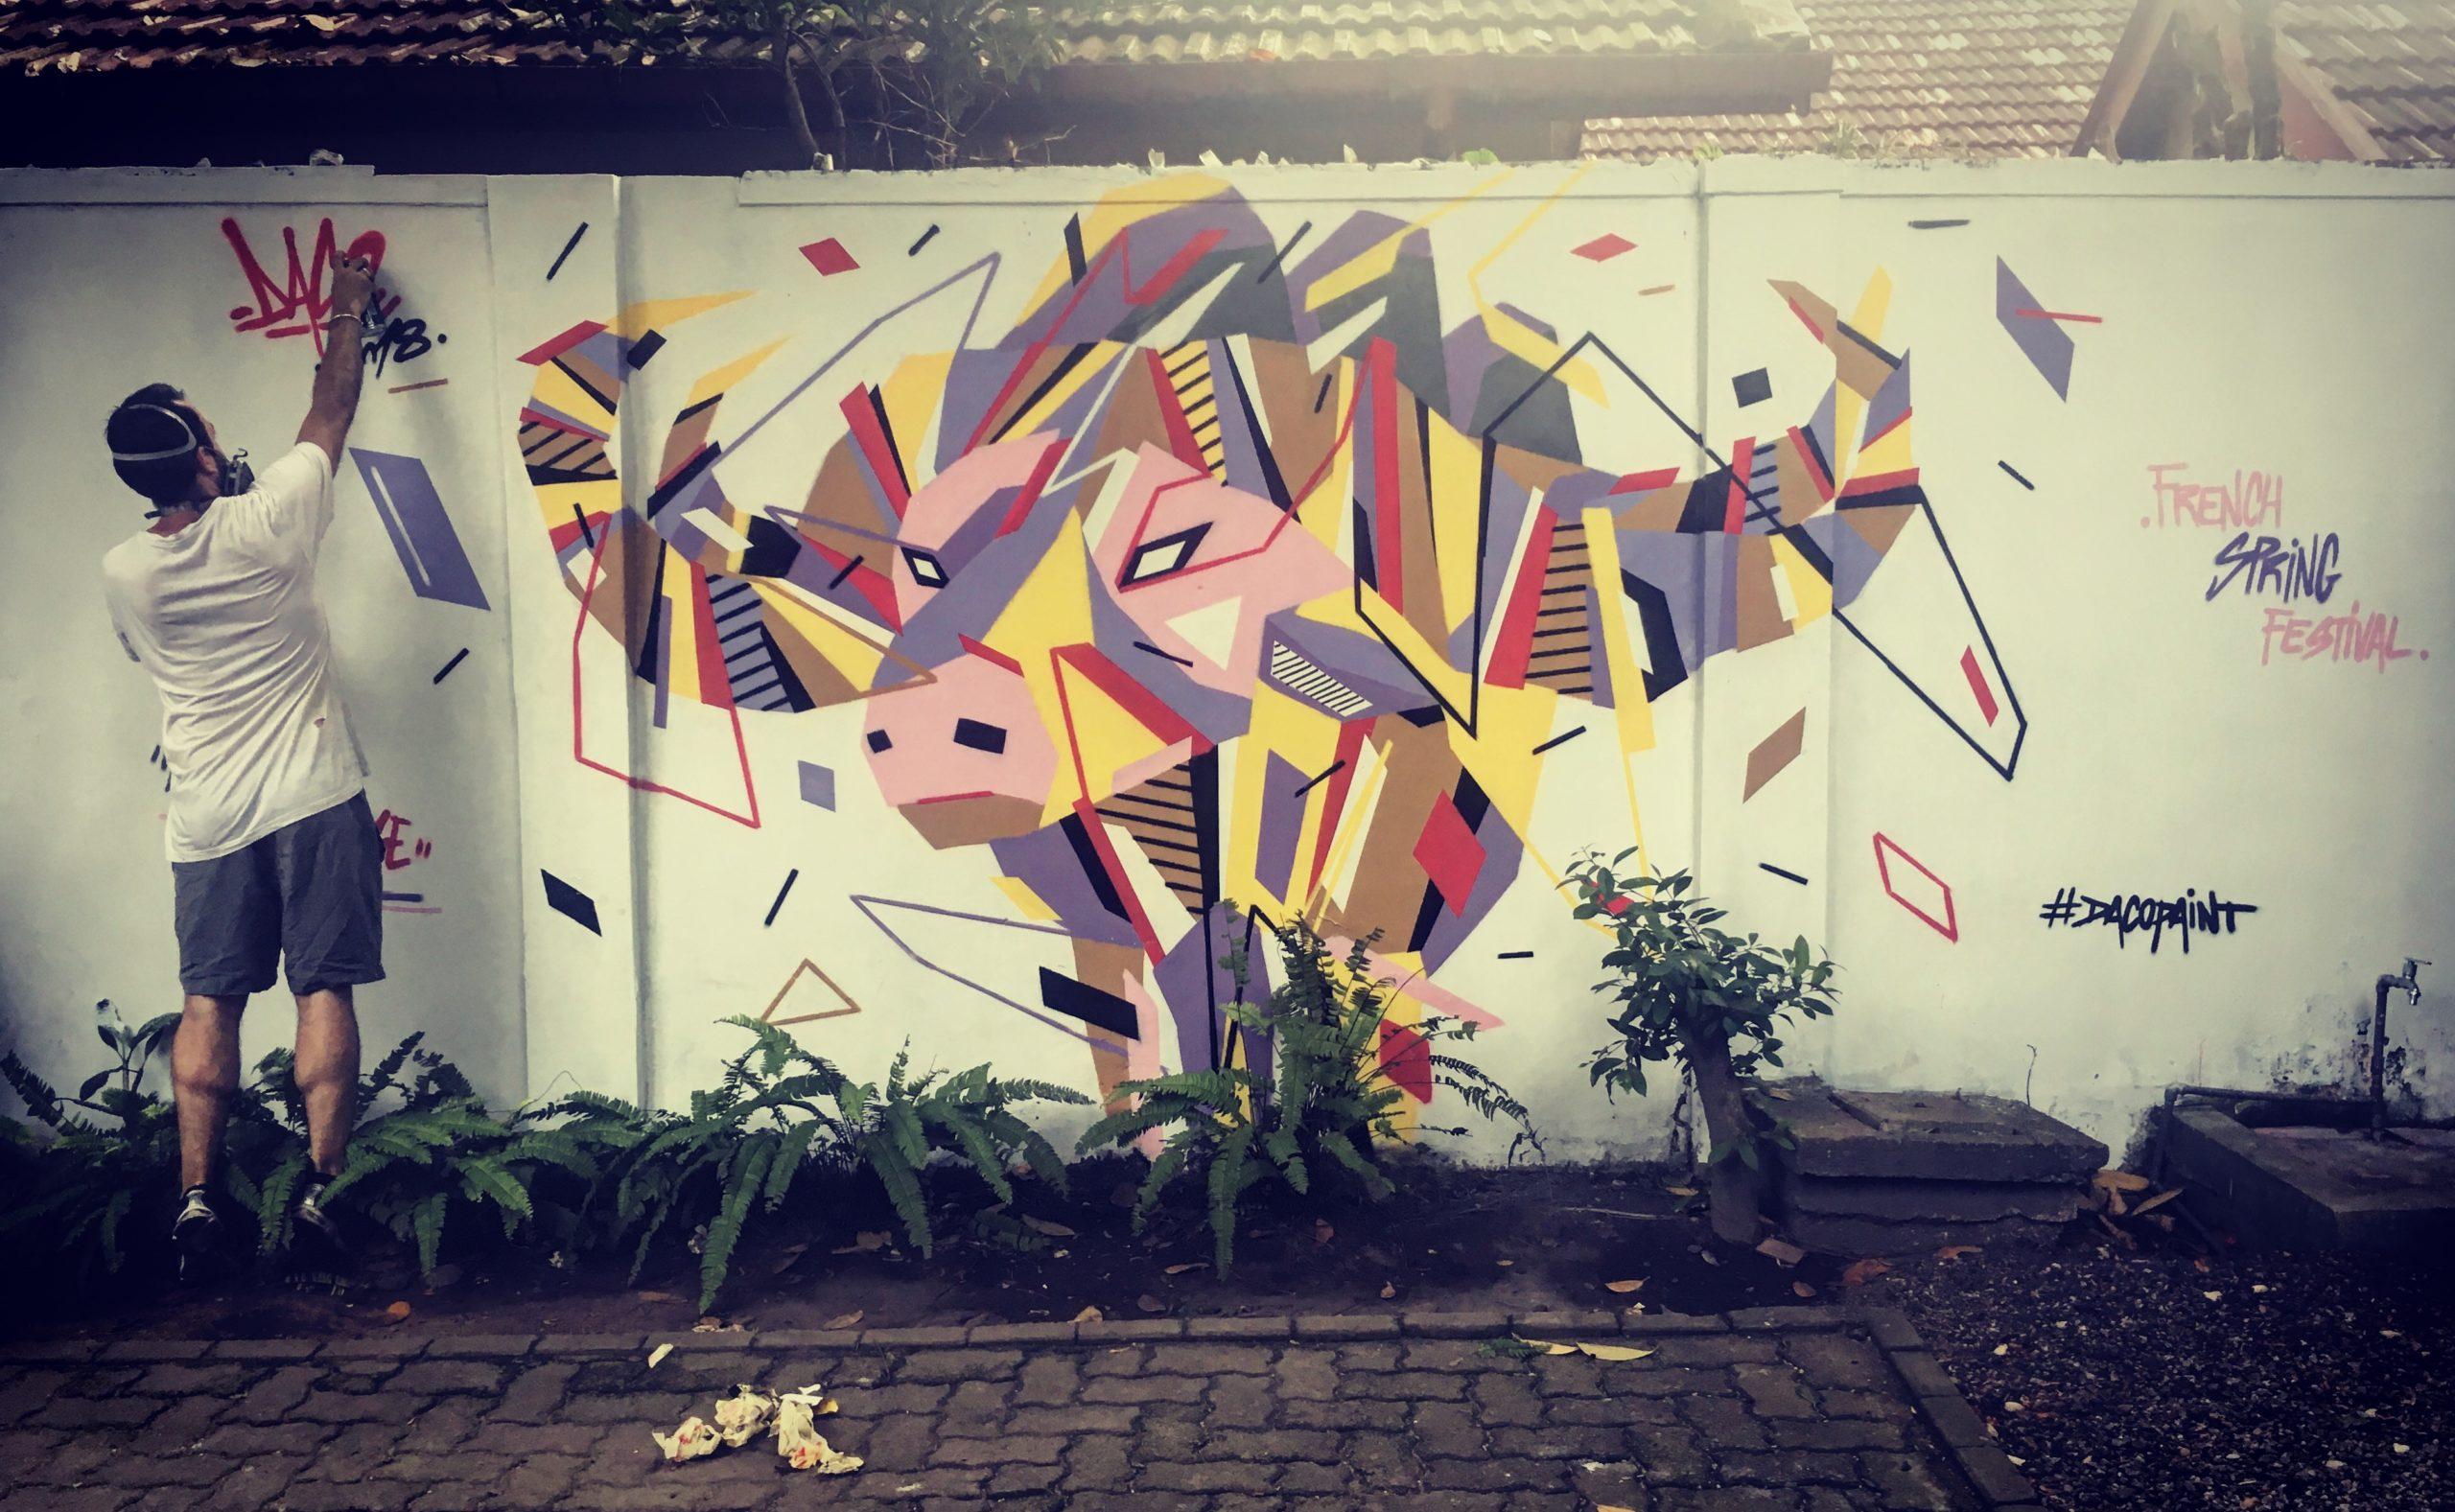 Fresque Graffaune Graffiti buffle réalisée par Daco